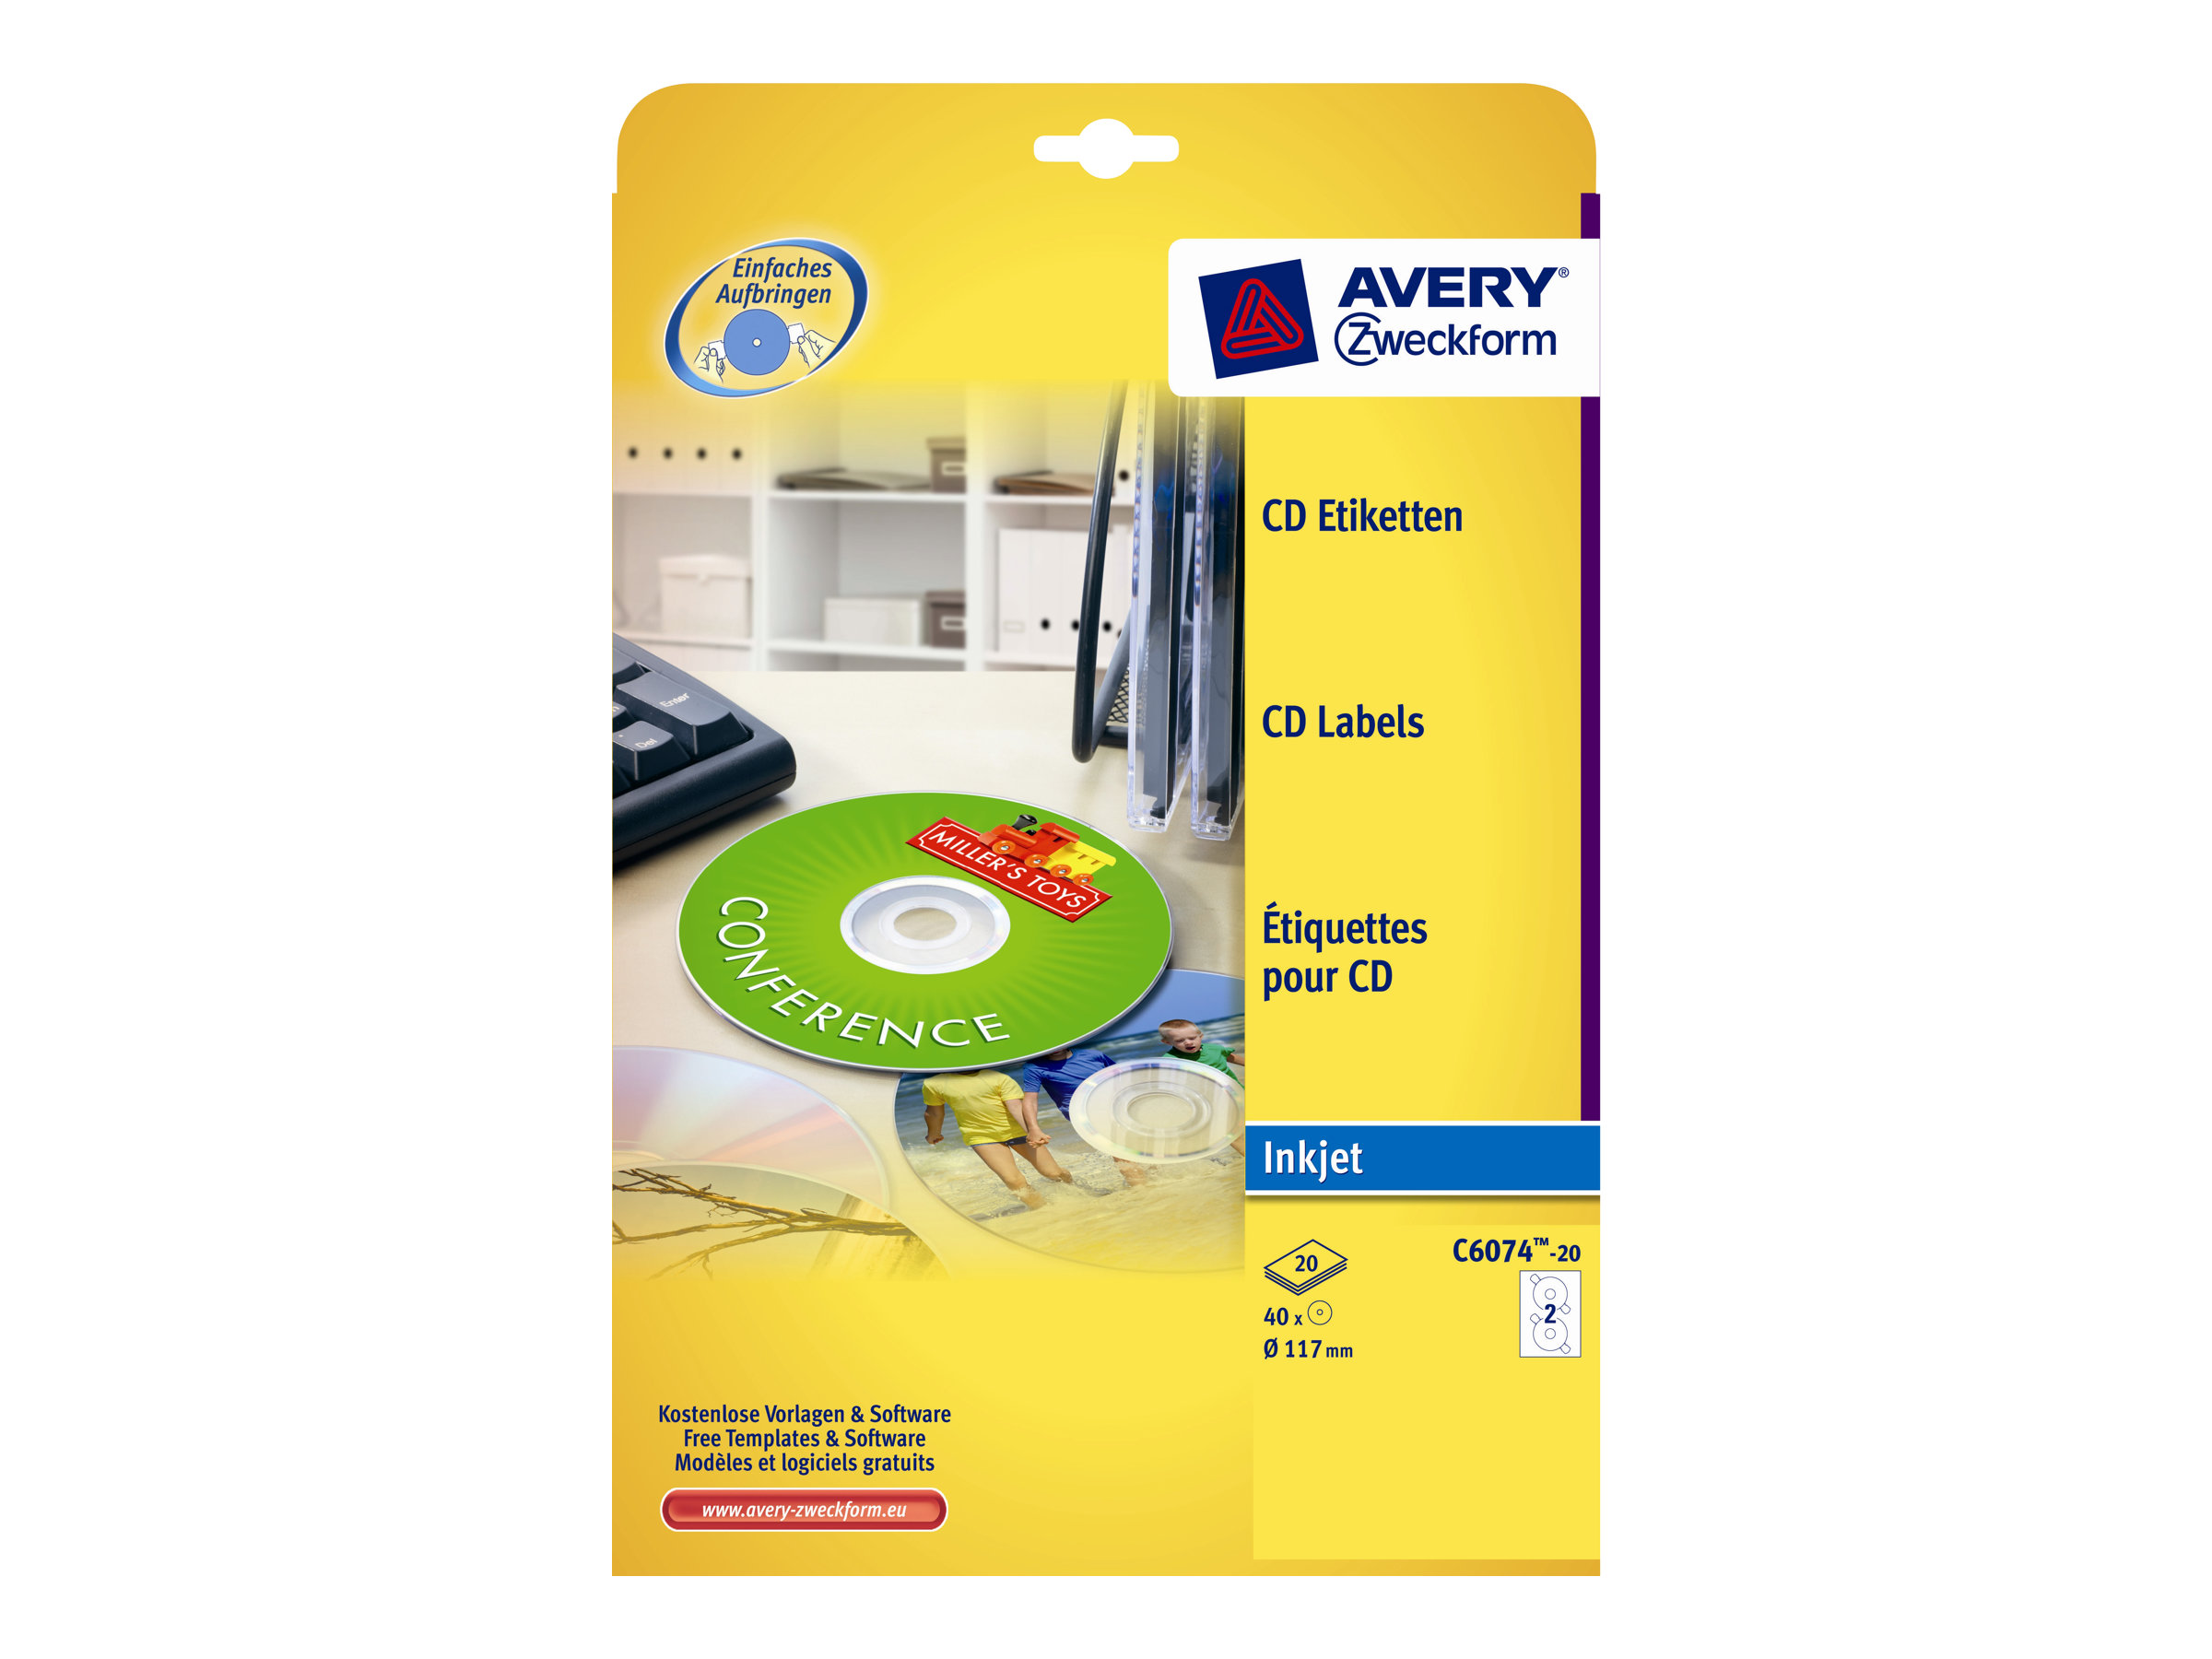 Avery Zweckform CD/DVD Labels - Glänzend